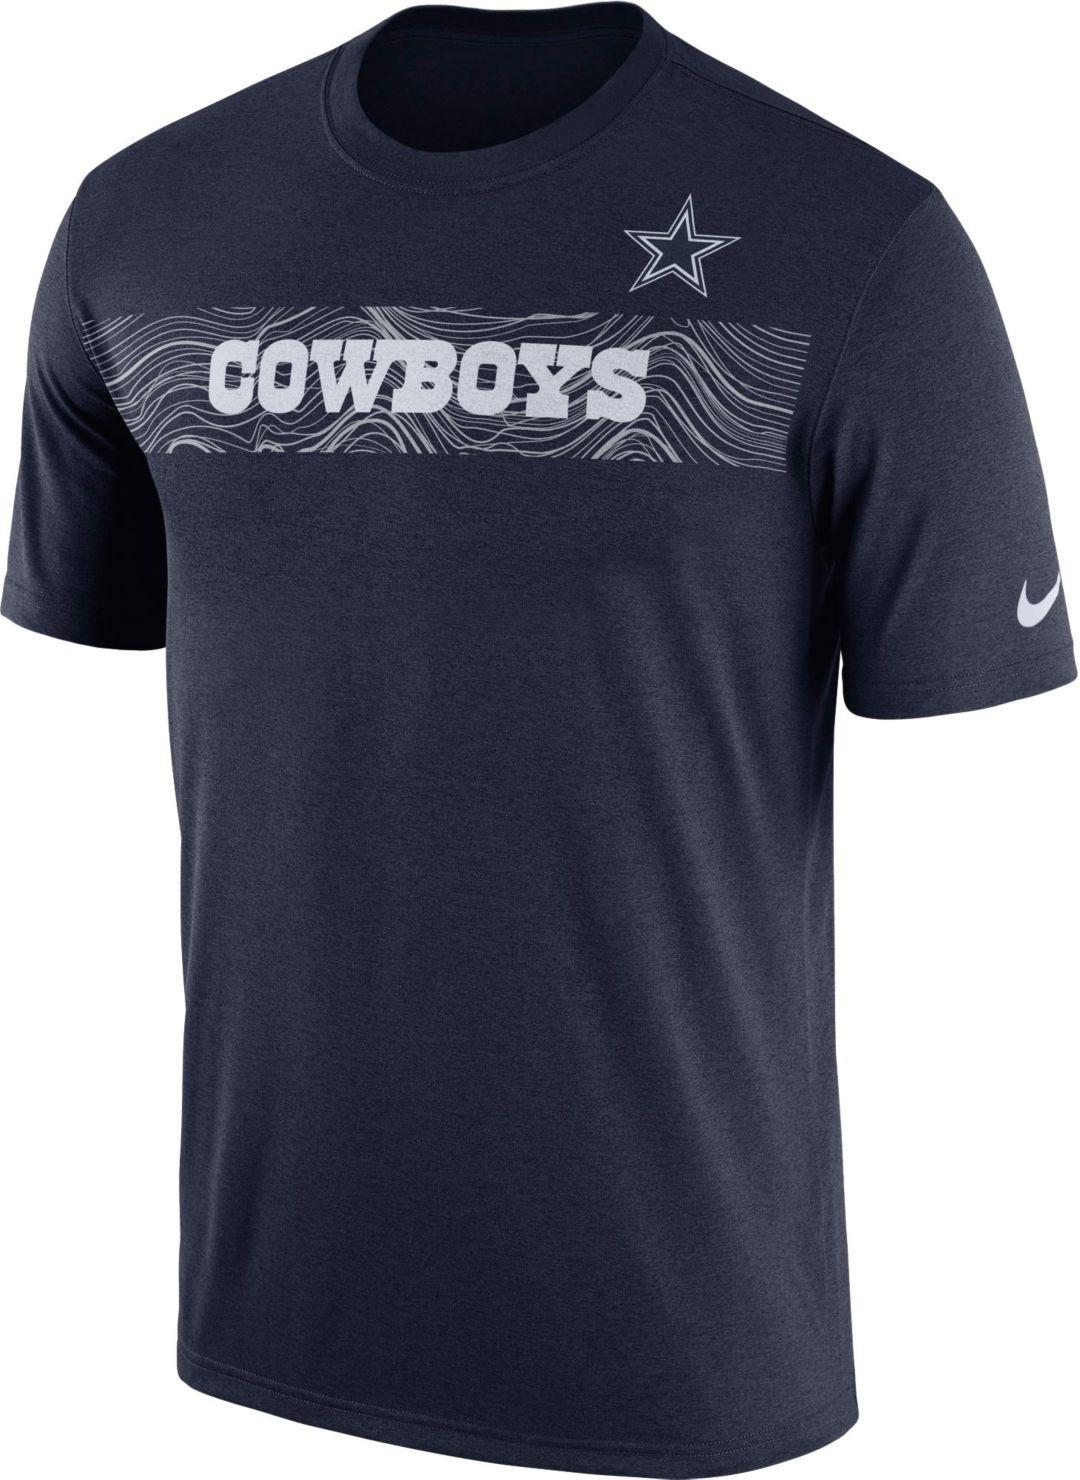 aceba1f6feaac Nike Men's Dallas Cowboys Sideline Seismic Legend Performance Navy T-Shirt.  noImageFound. Previous